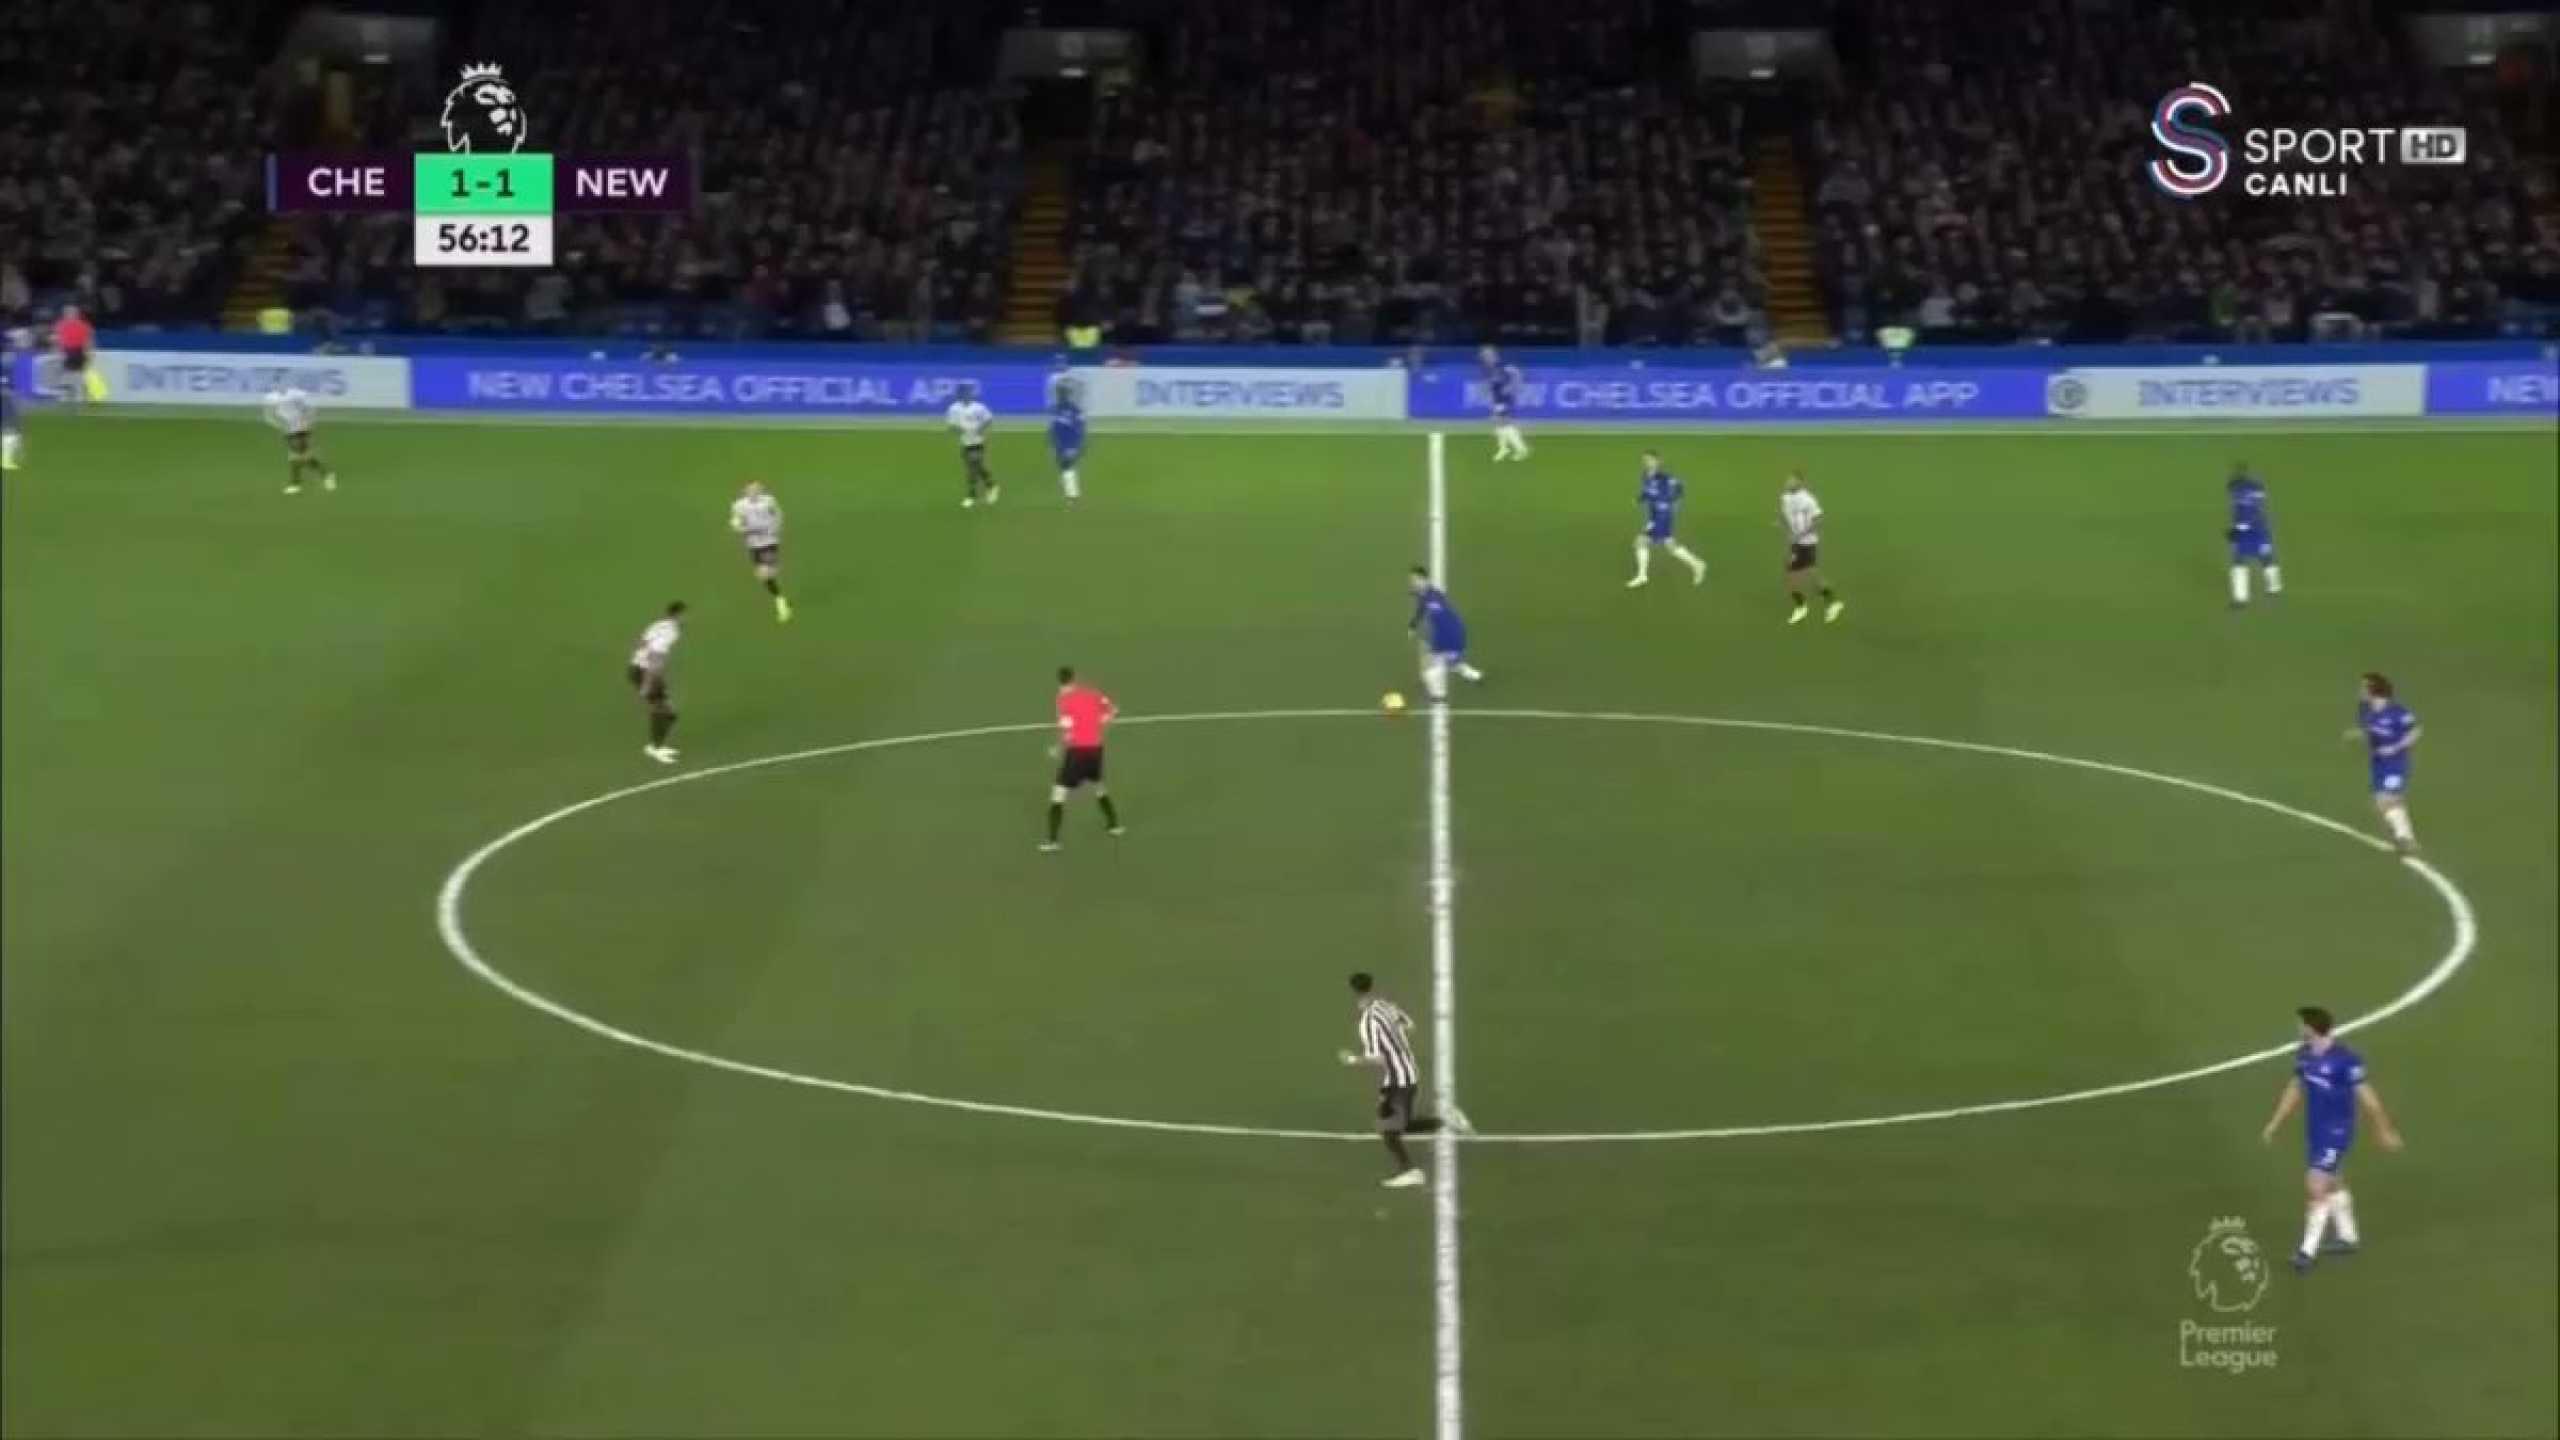 Willian marca golaço após jogada individual de Hazard